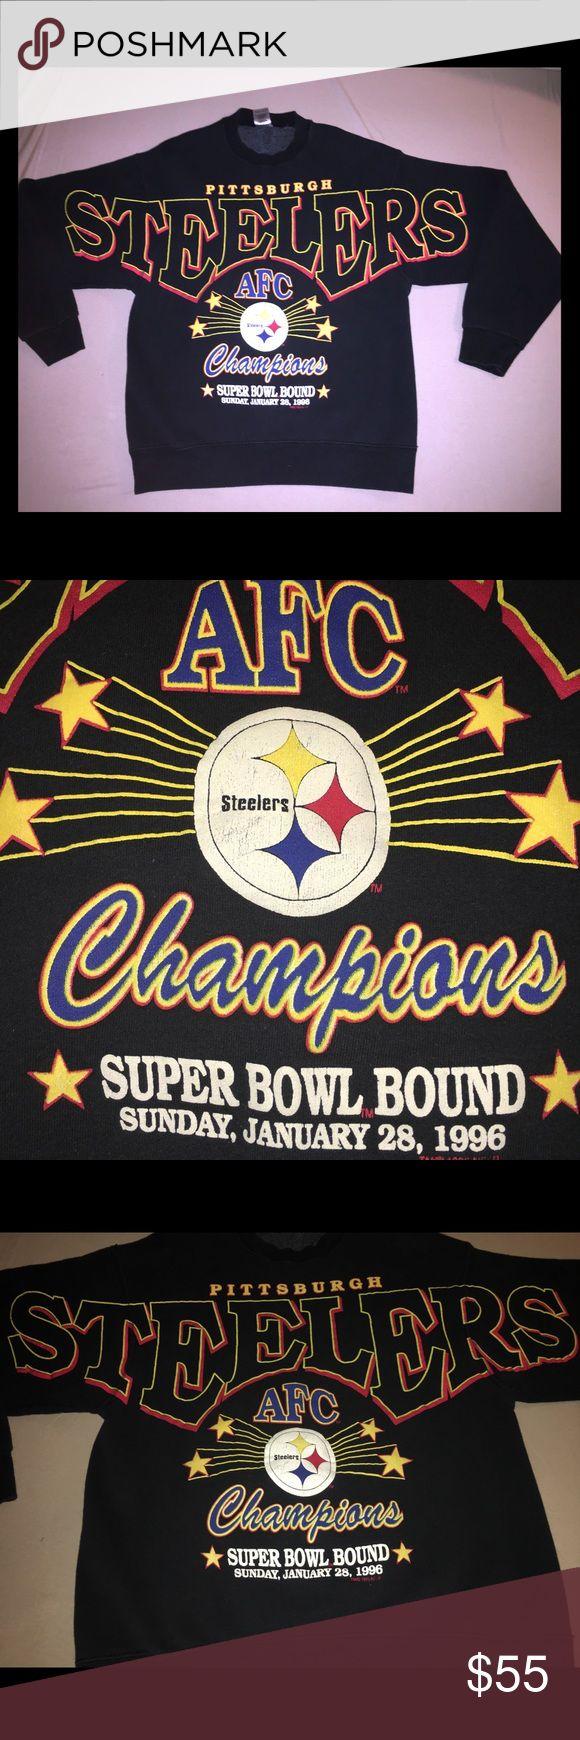 Vintage Pittsburgh Steelers Super Bowl Sweatshirt 100% Authentic   Official NFL Super Bowl Merchandise   Pittsburgh Steelers   1996 AFC Champions   Super Bowl Bound   Vintage Sweatshirt   Men's Size Large   100% Cotton Shirts Sweatshirts & Hoodies